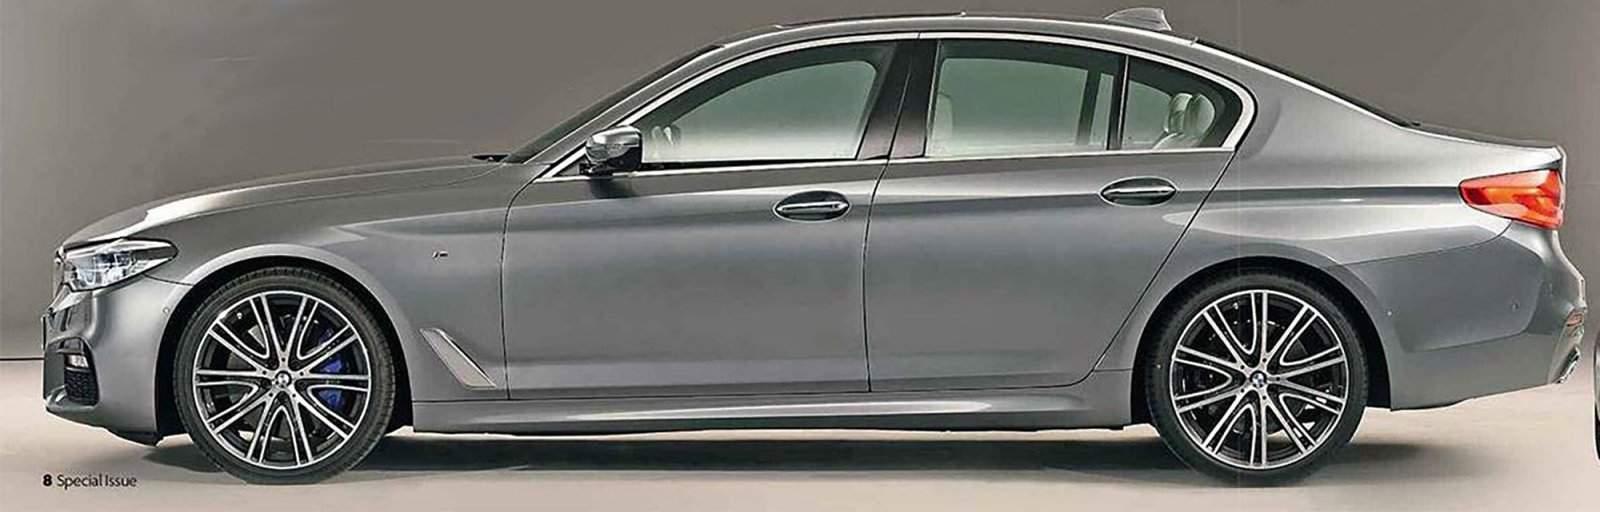 Name:  BMW-5-Series-G30-b.jpg Views: 16551 Size:  76.0 KB